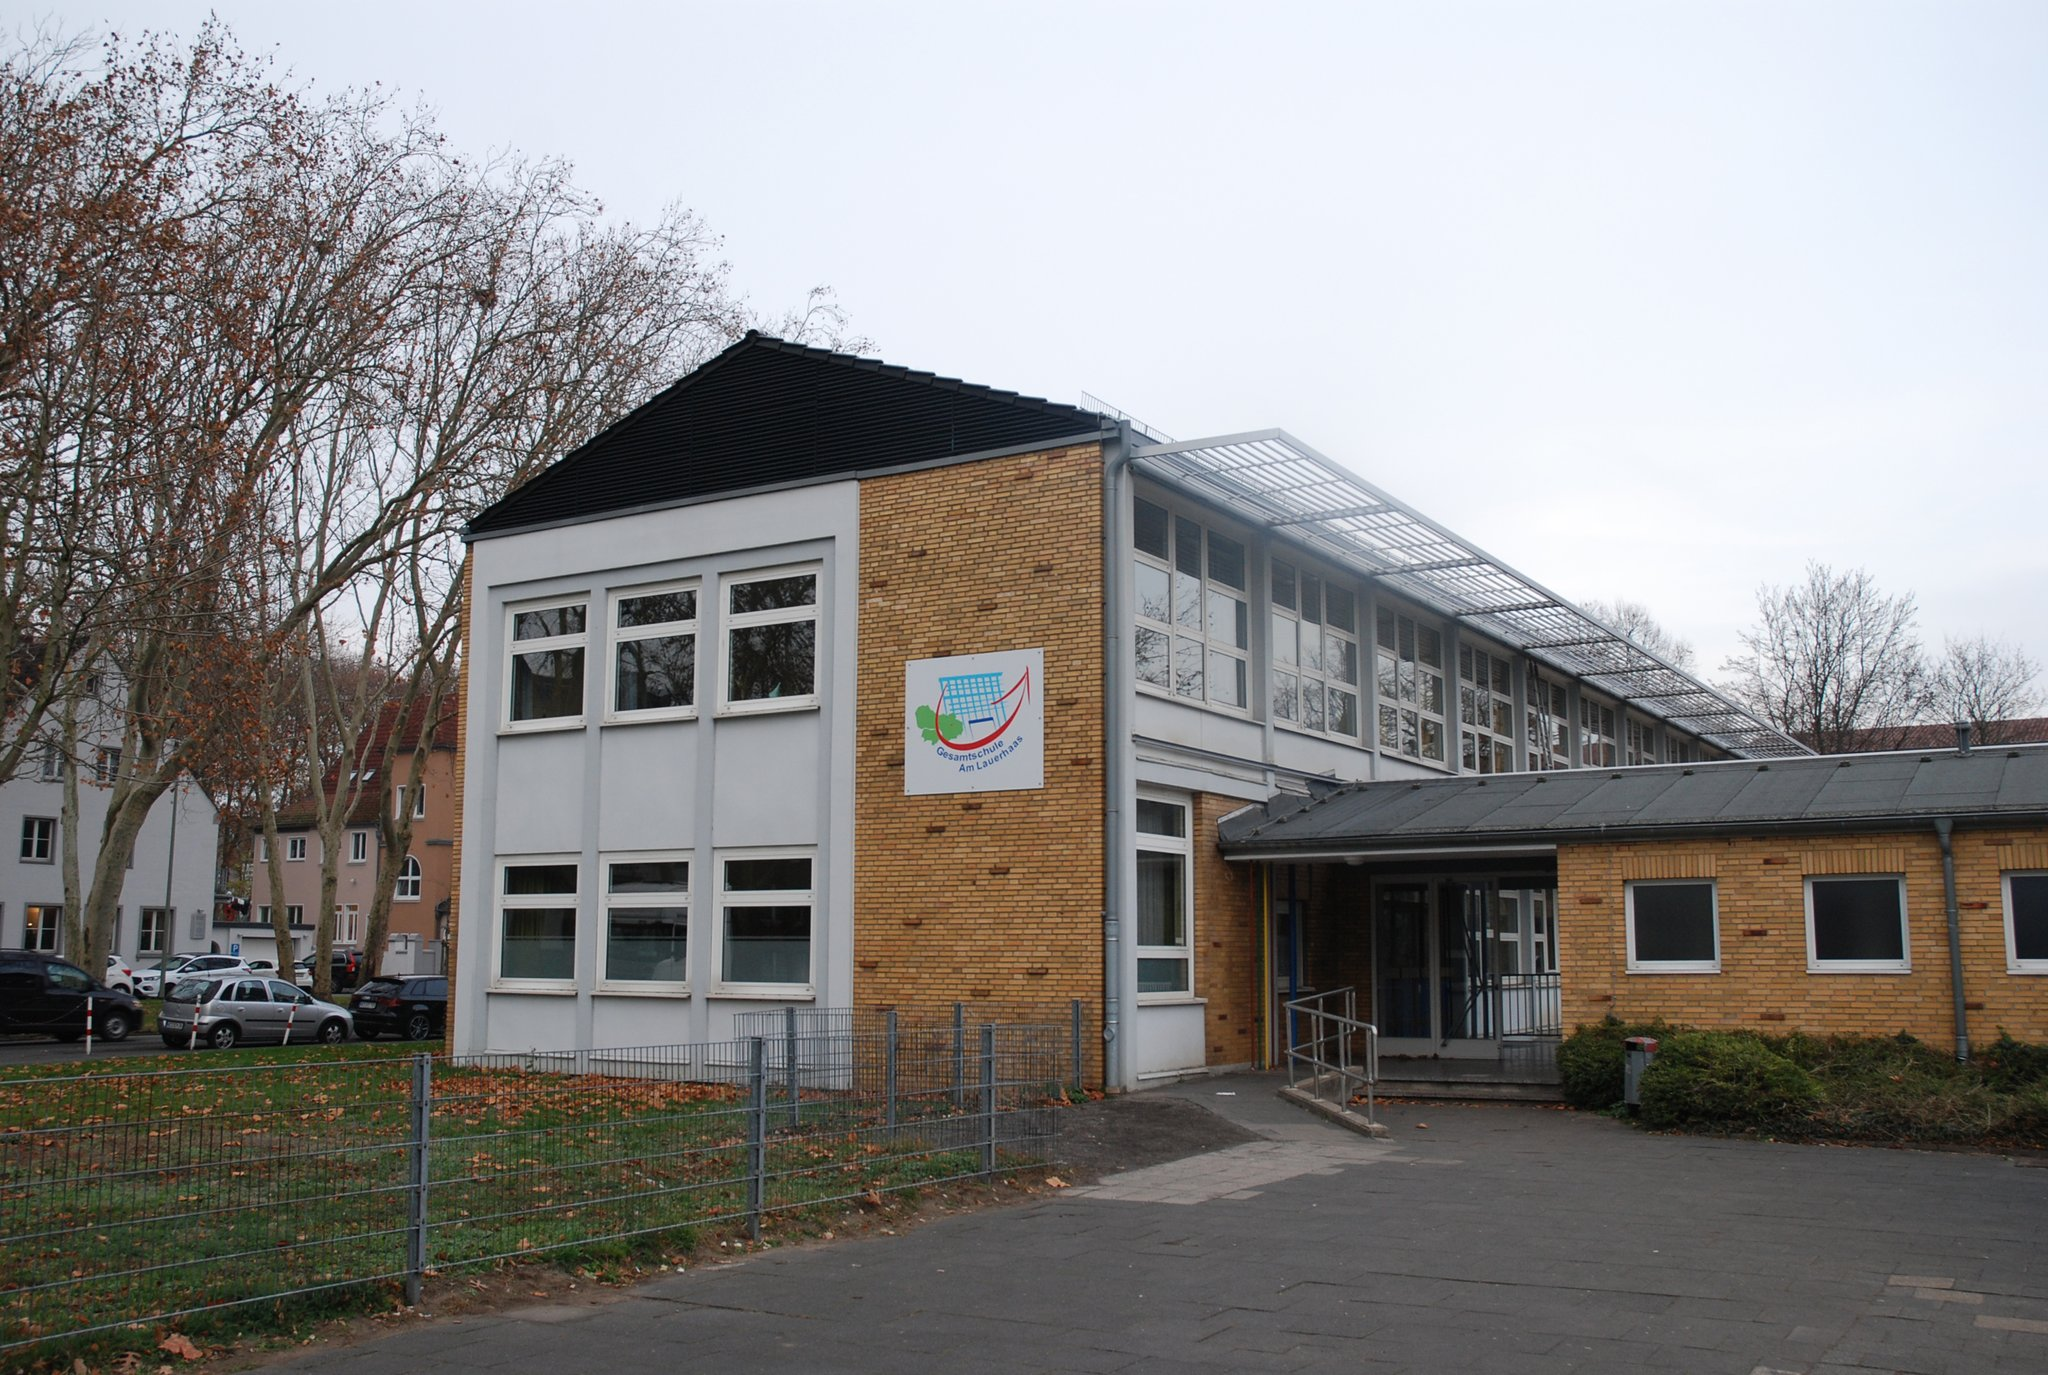 Gesamtschule Oder Realschule